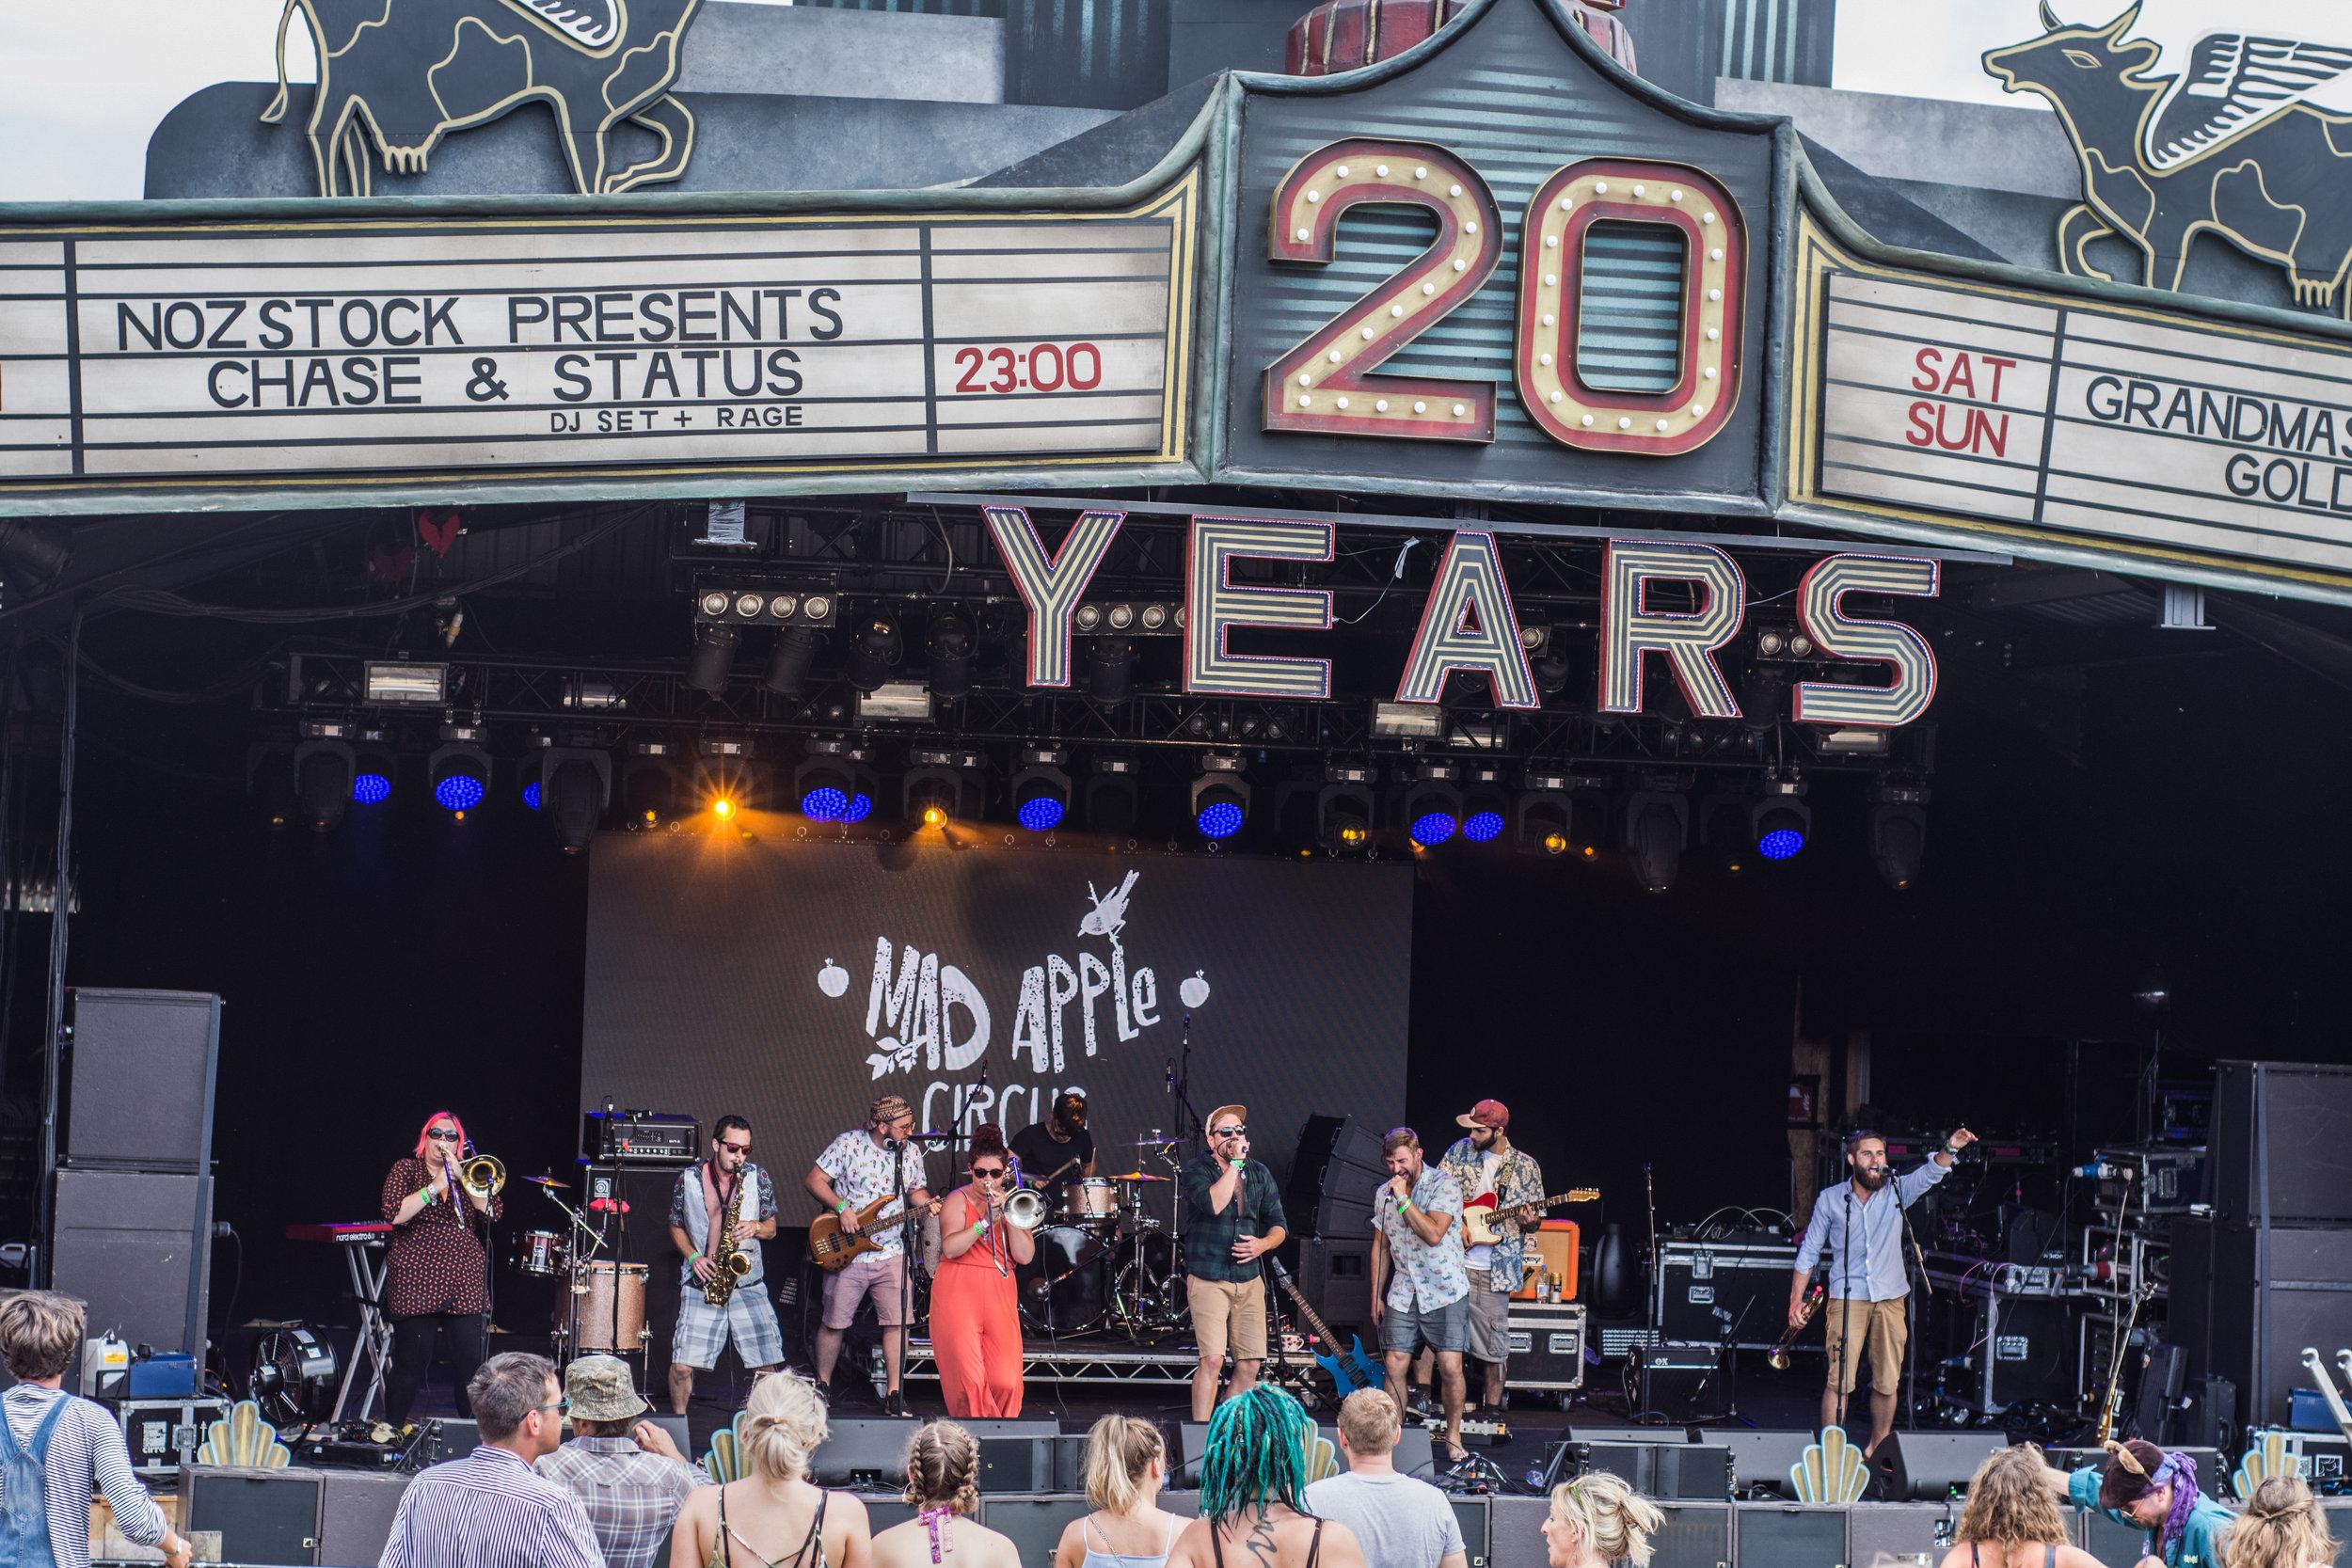 Orchard Stage: Nozstock 2018